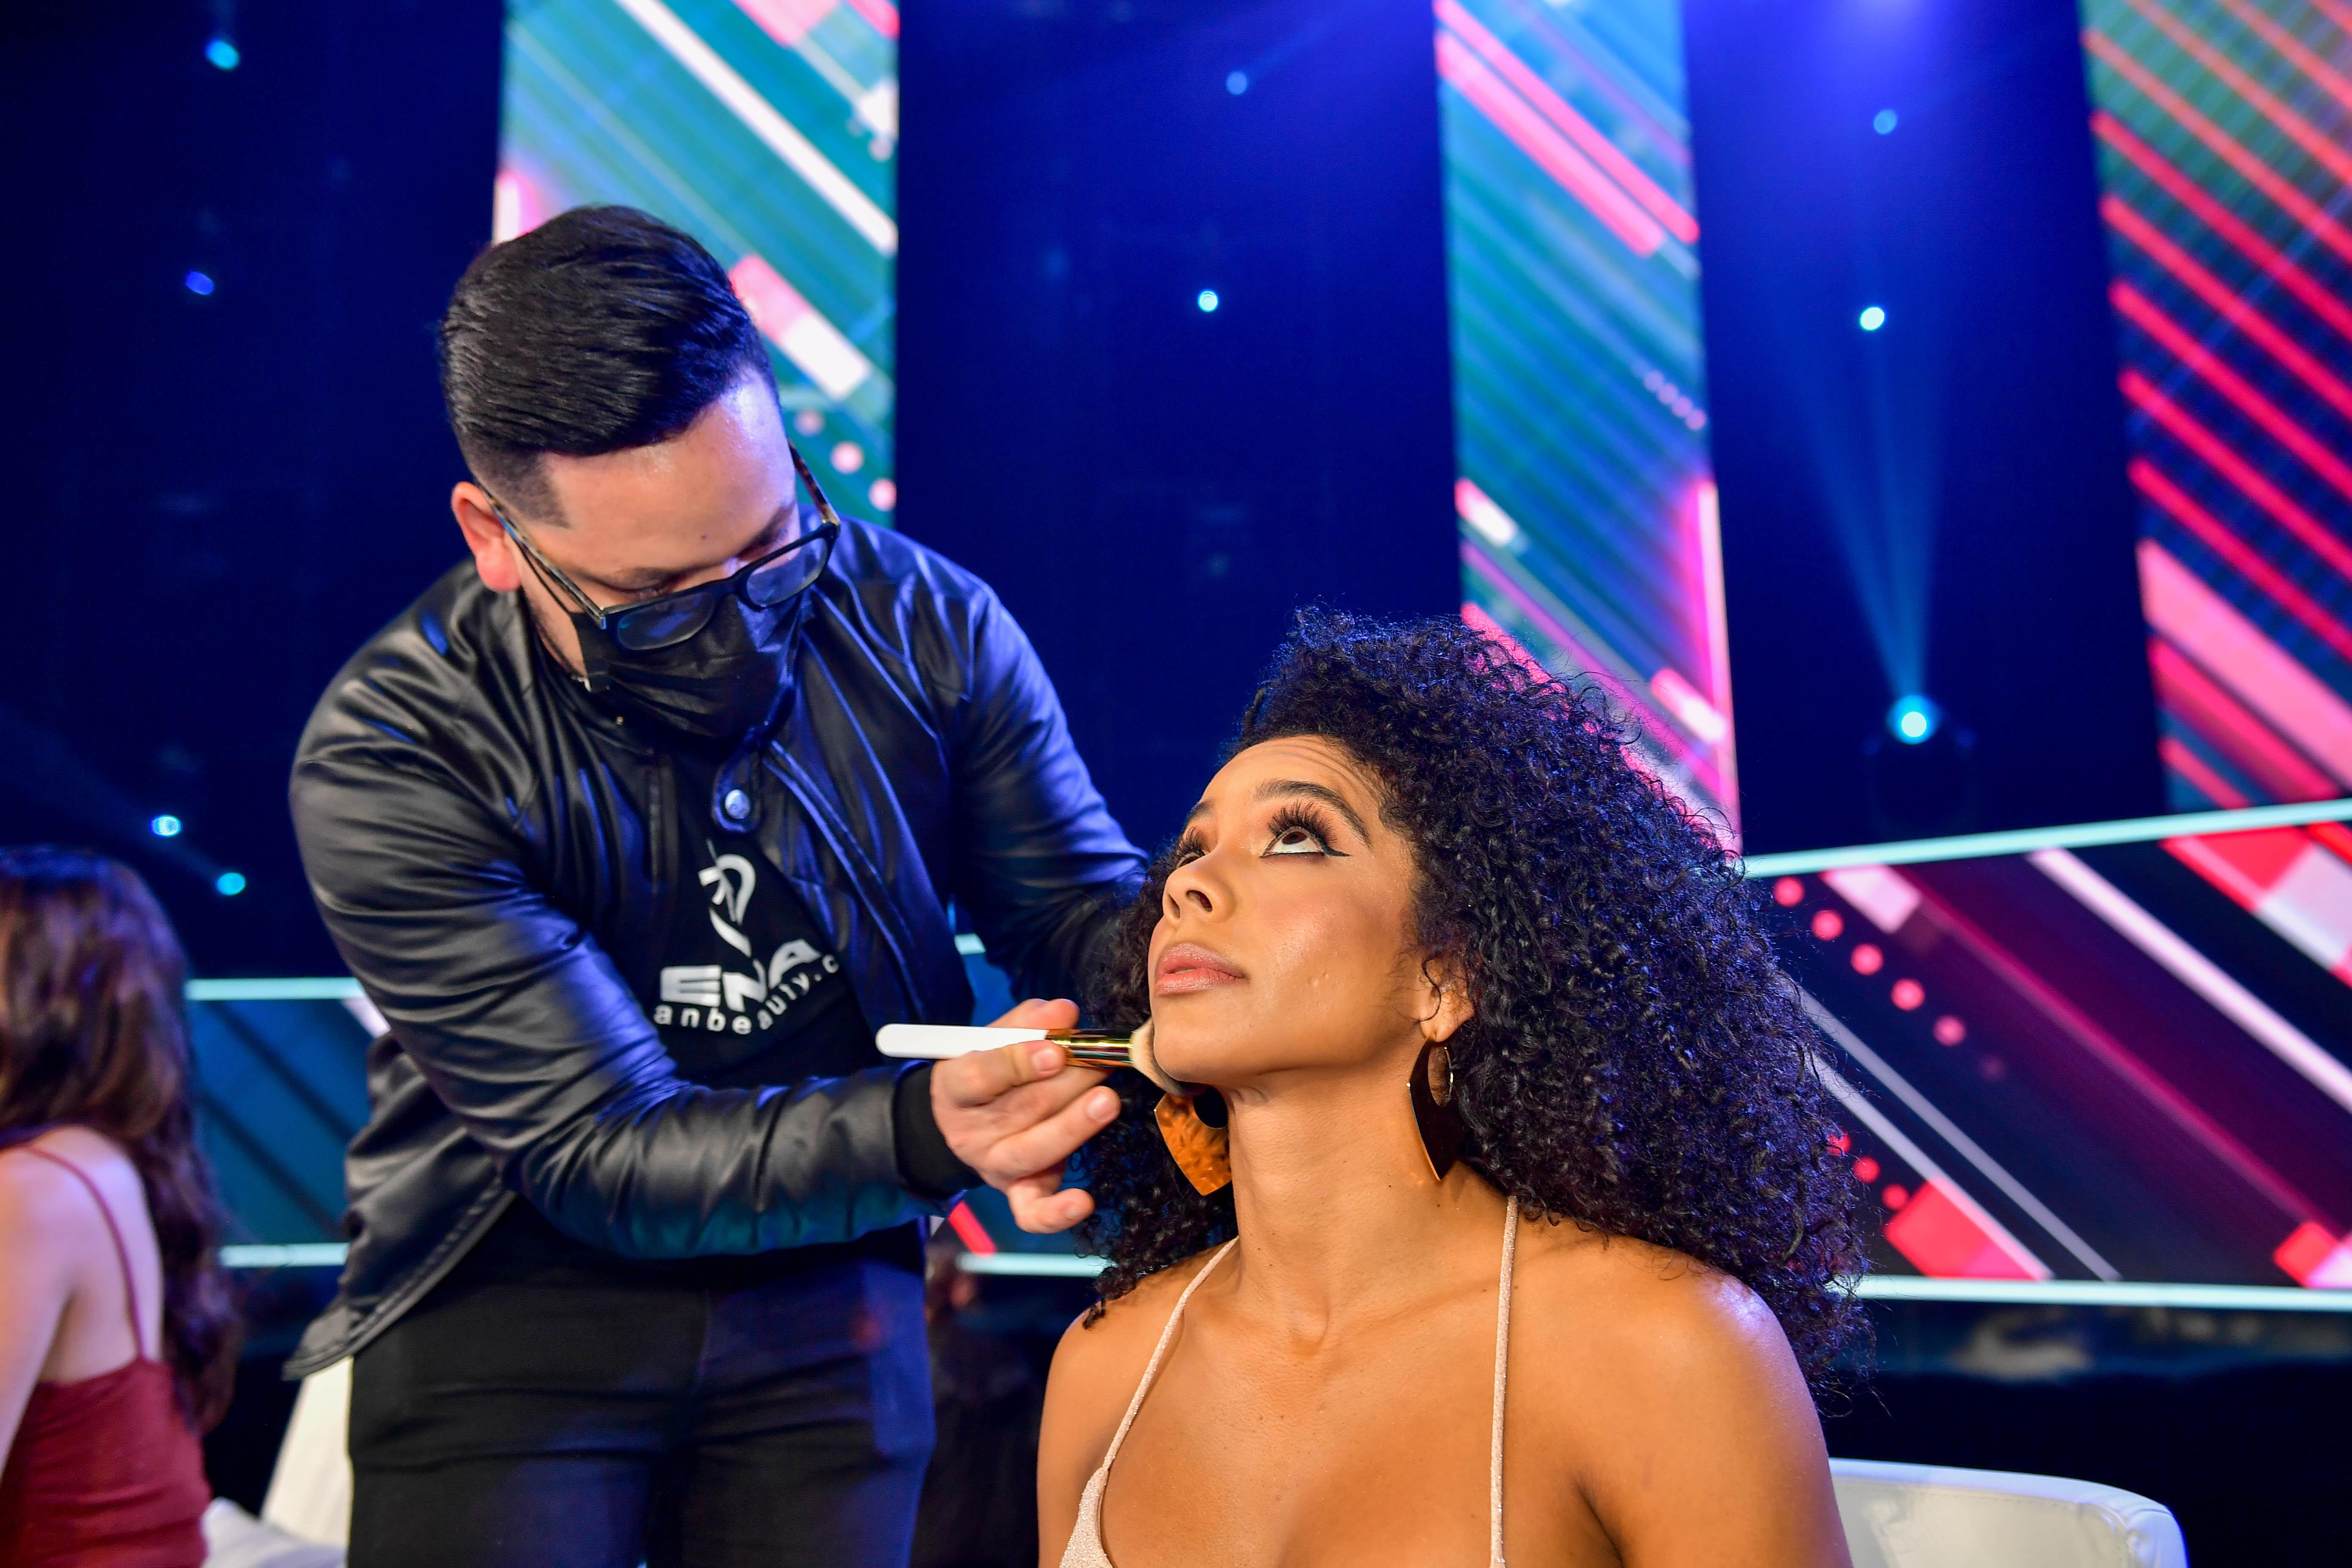 Photos of contestants from Nuestra Belleza Latina